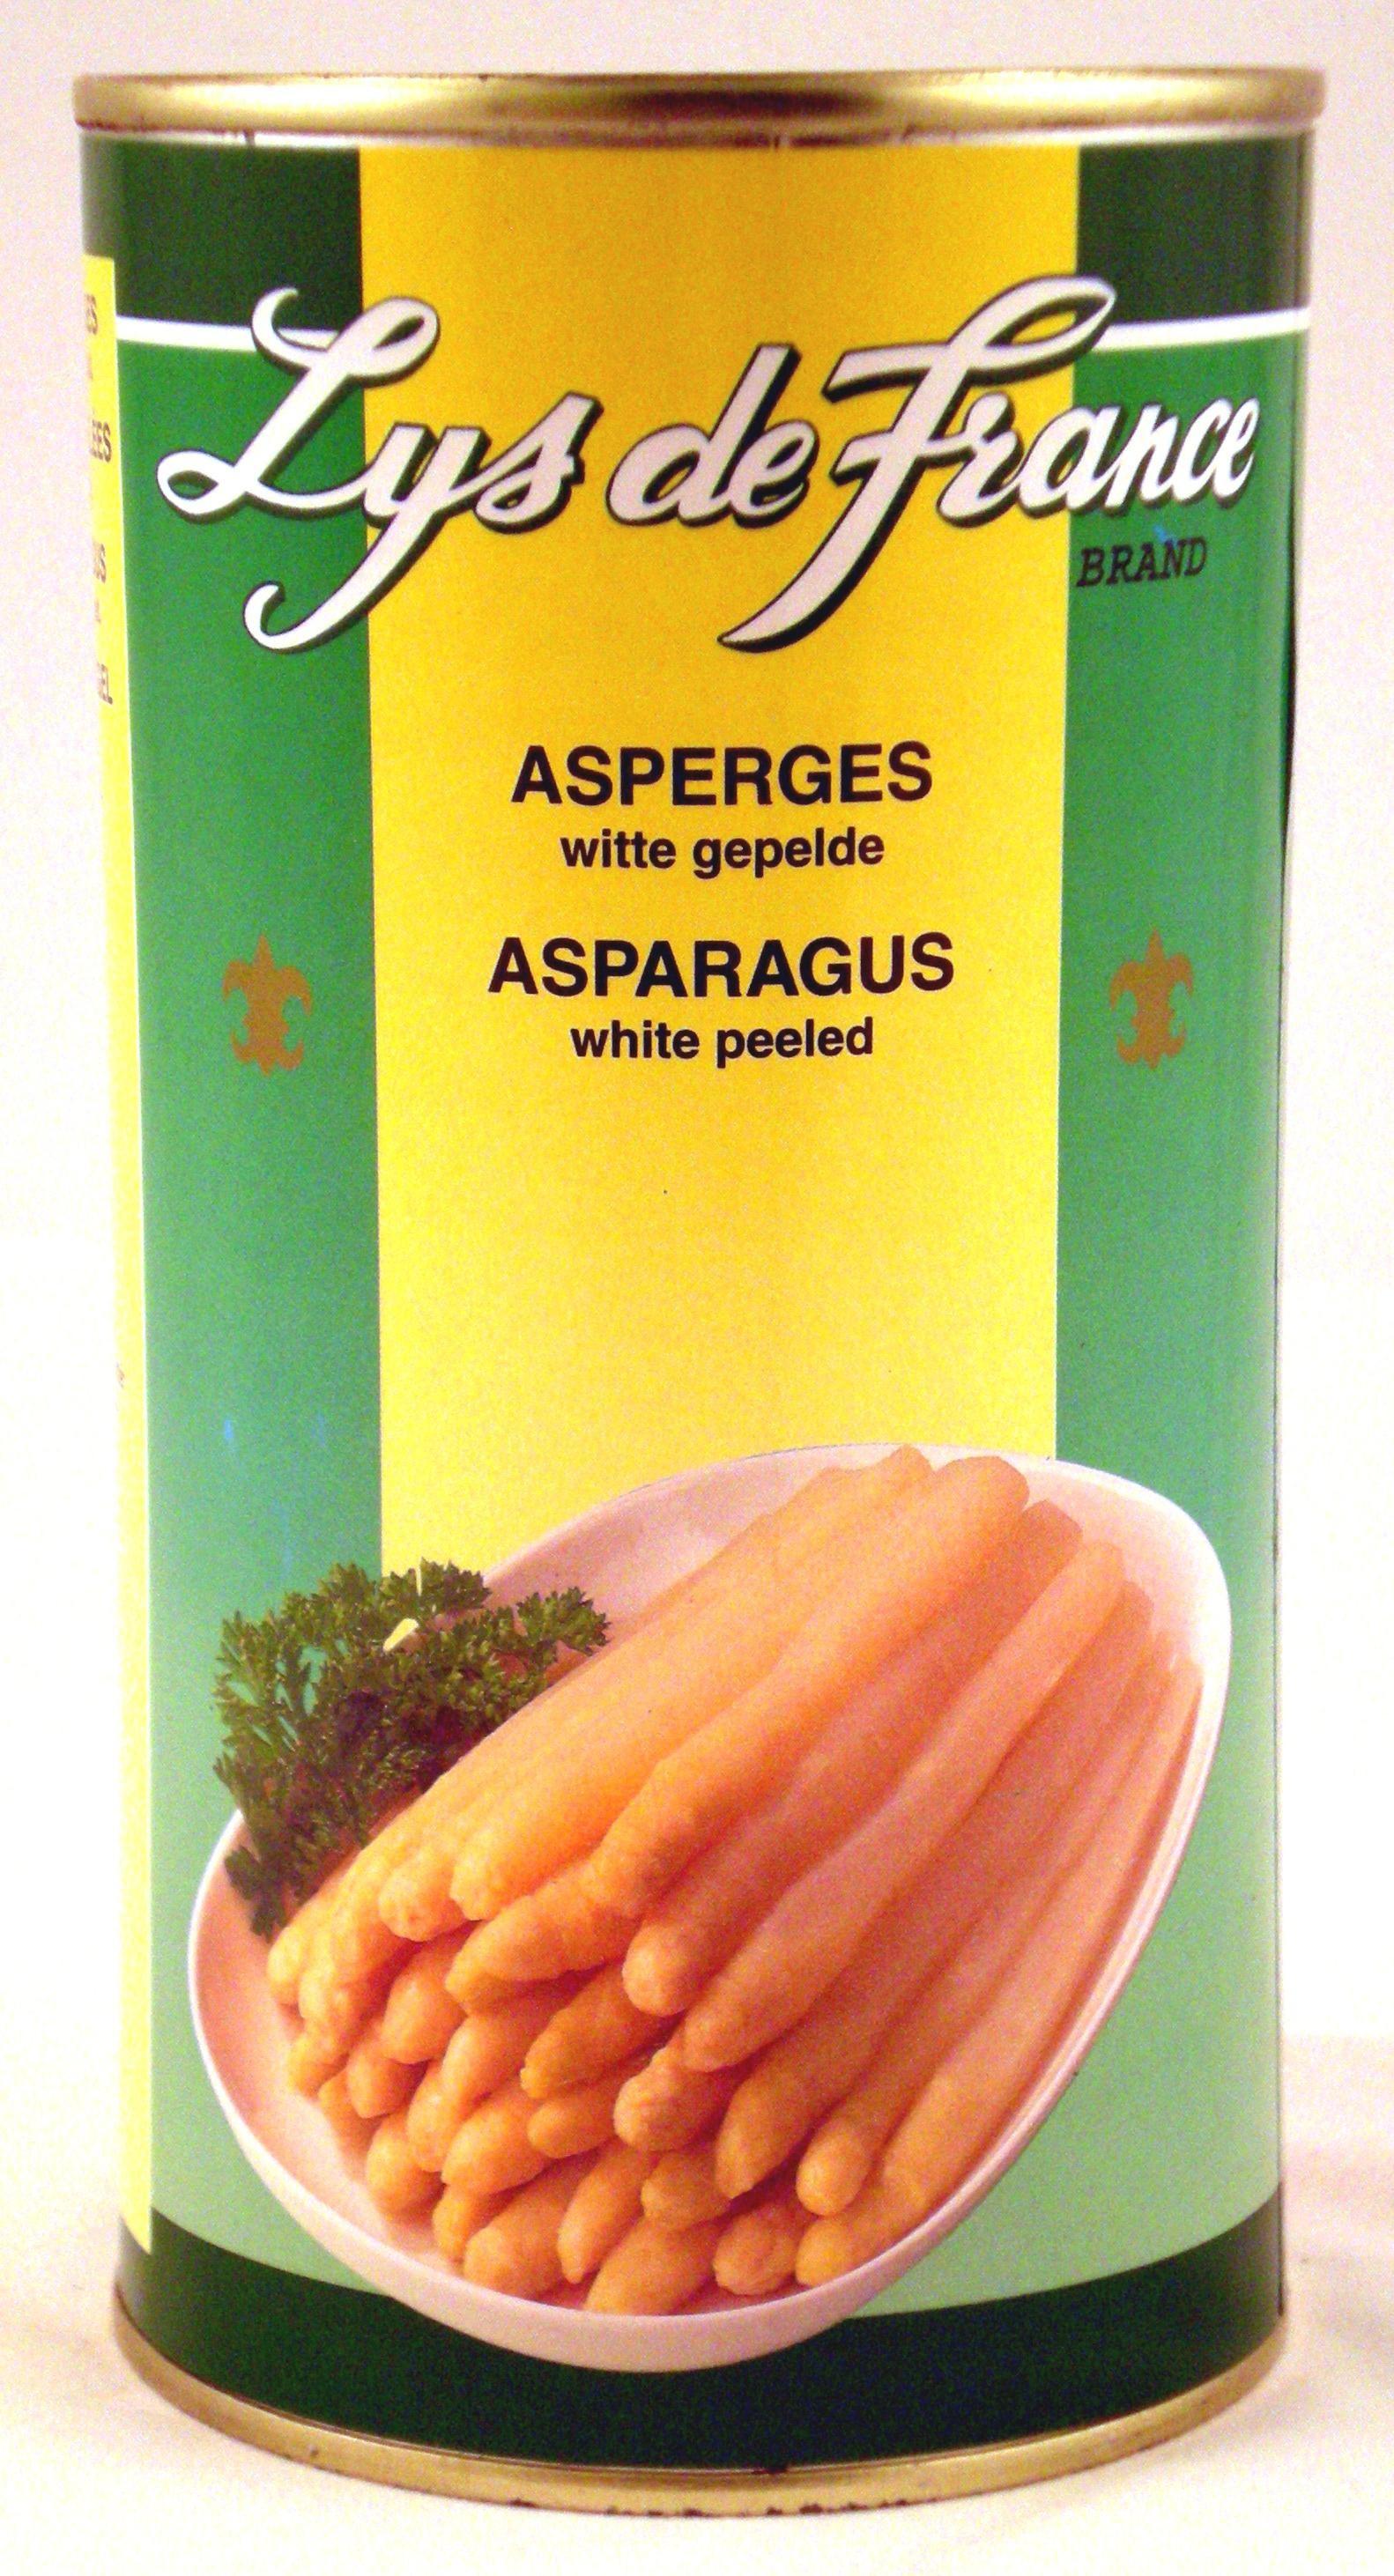 Witte asperges gepeld 0.5L Lys de France